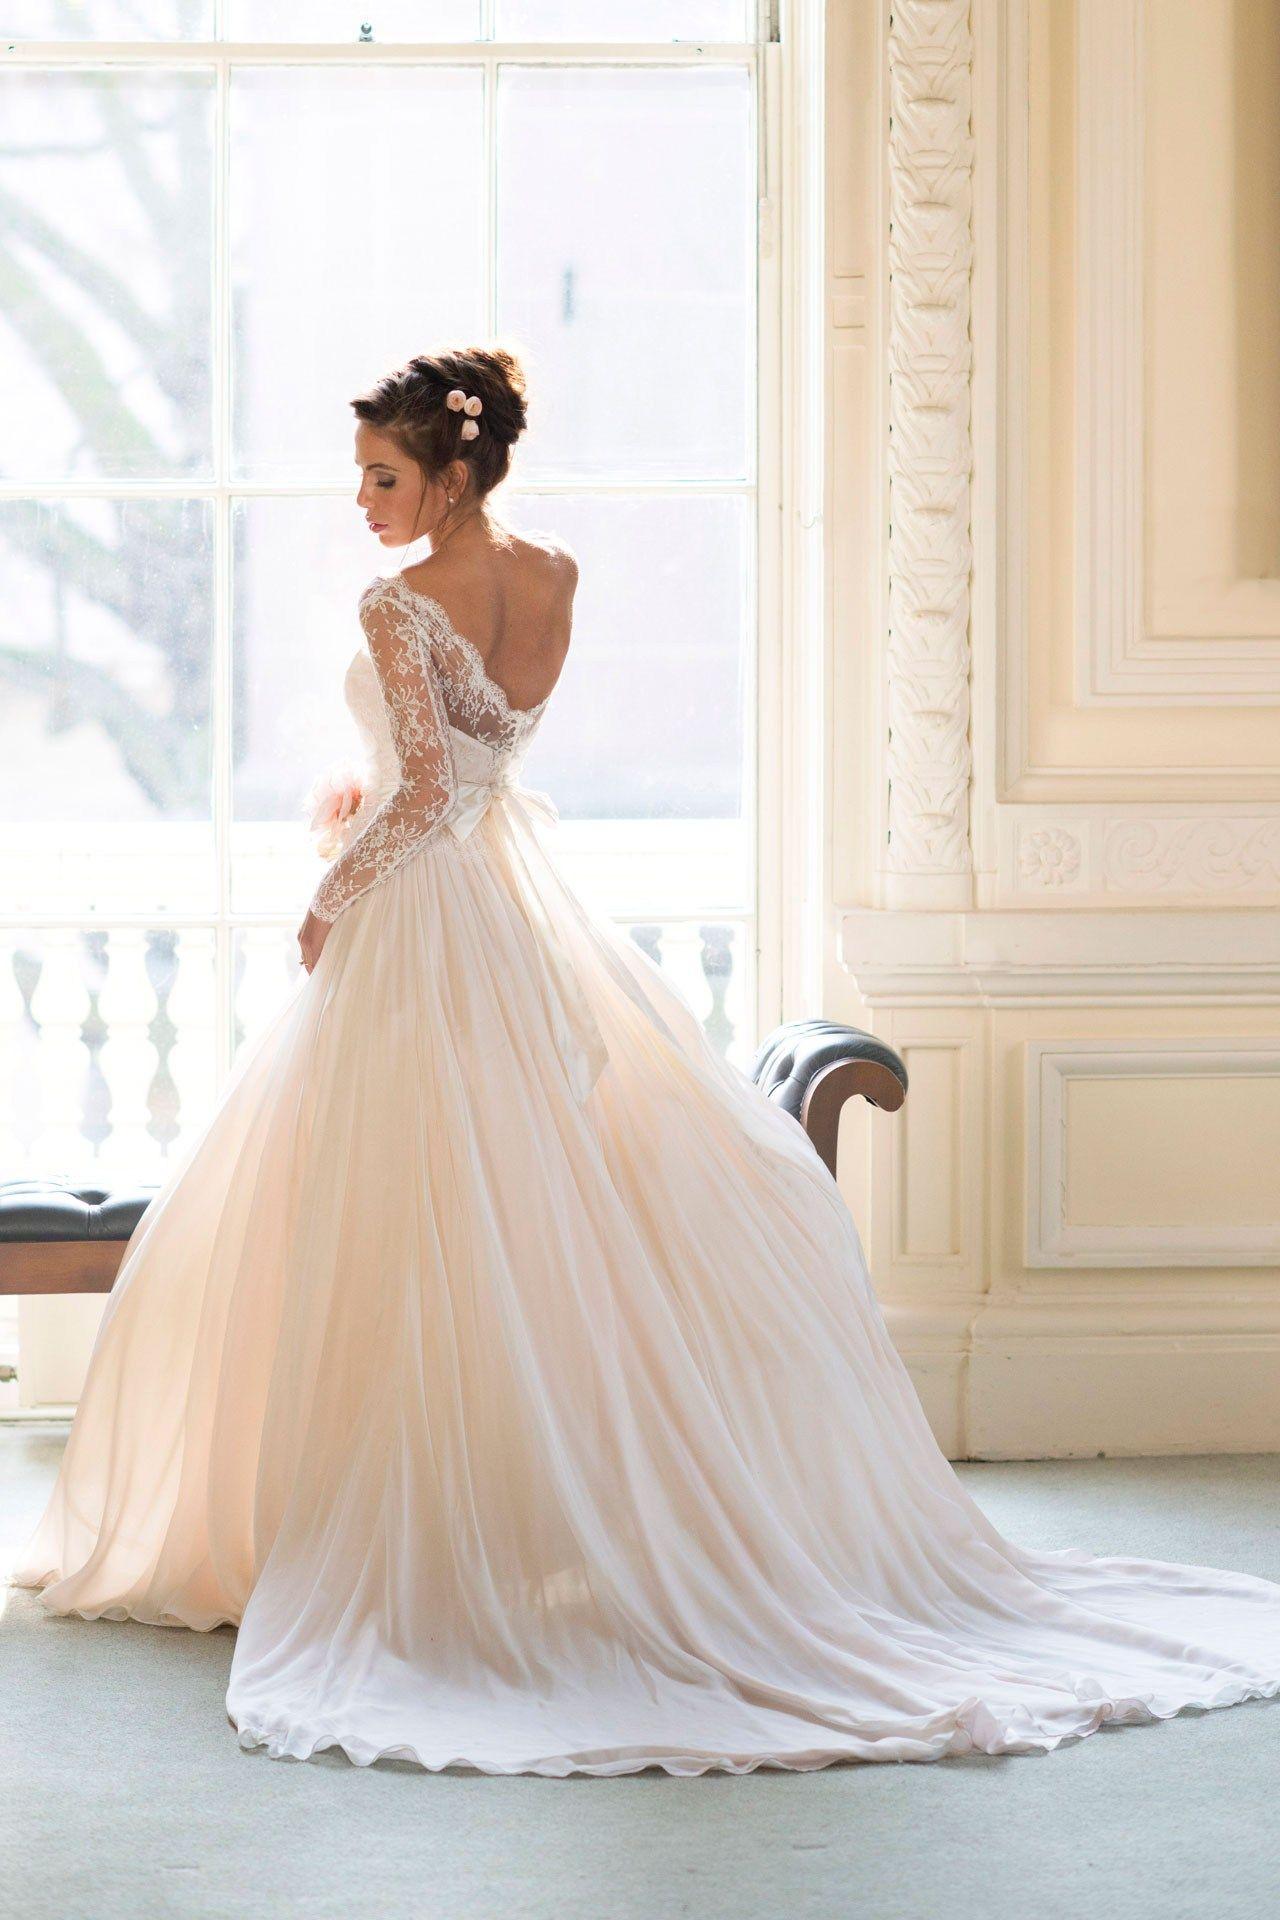 Vera wang designer wedding dresses  Wedding Dresses  The Ultimate Gallery BridesMagazine  Vera